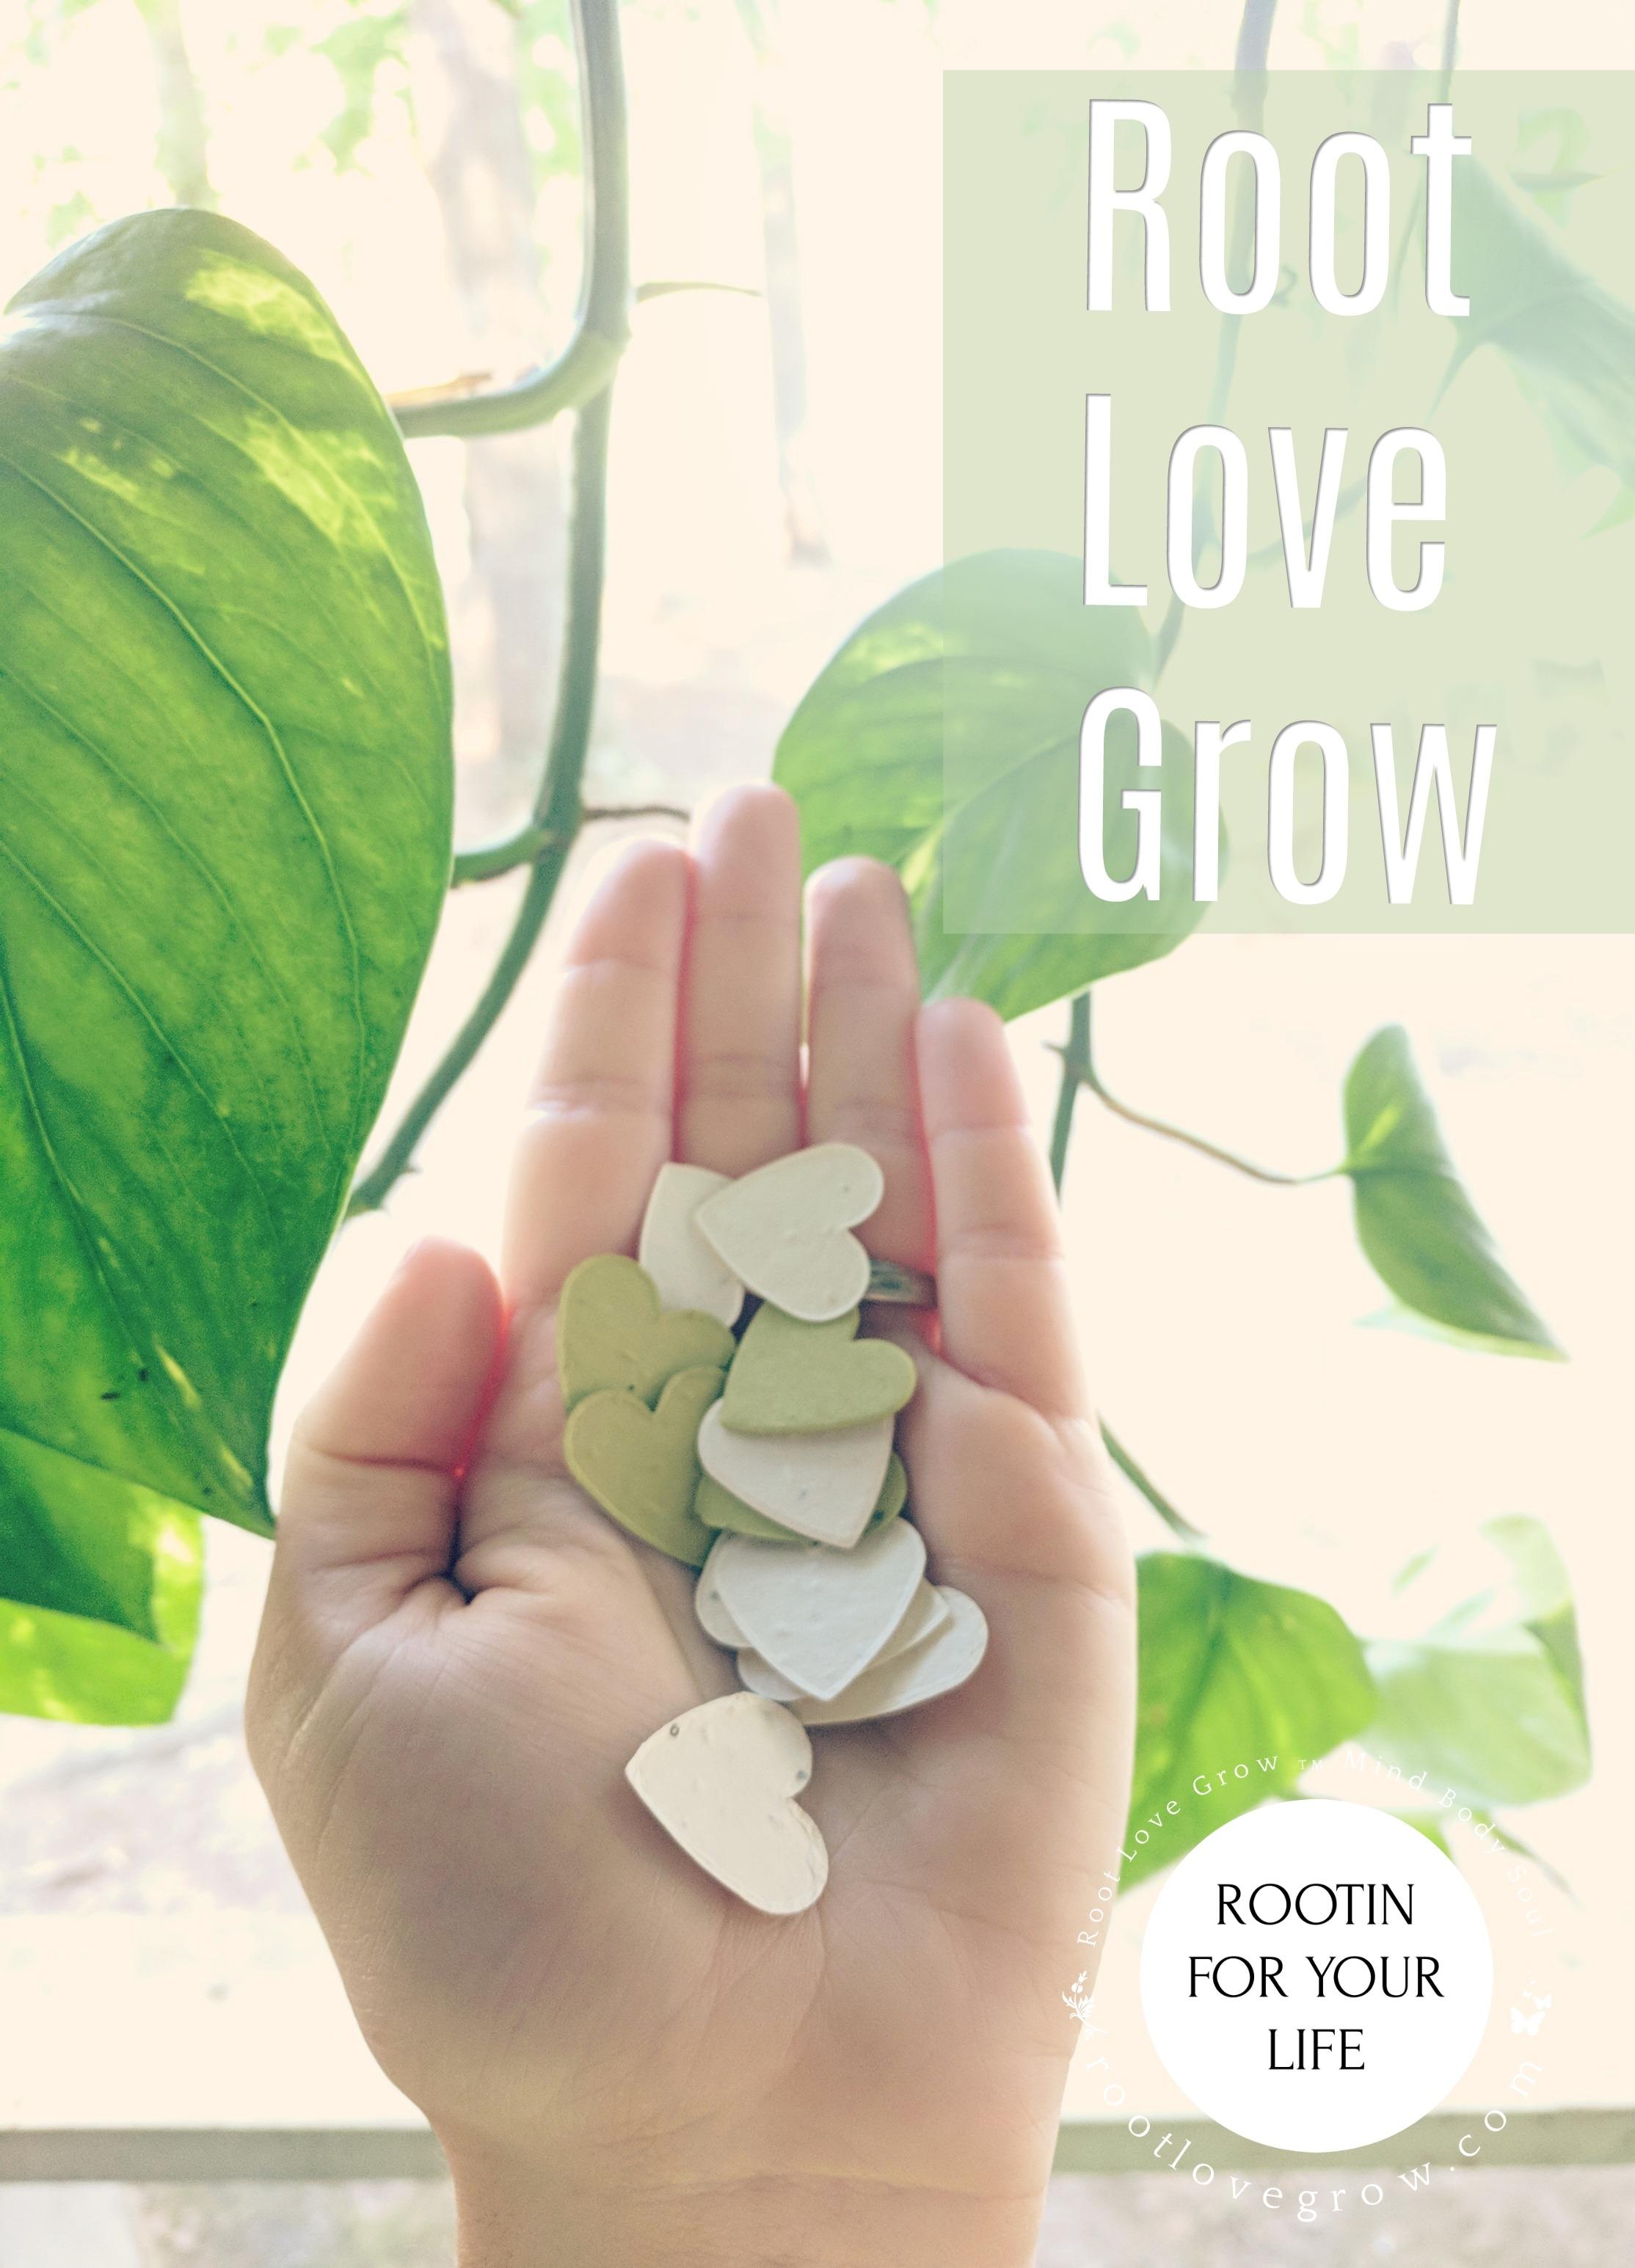 root love grow seeds pic.jpg